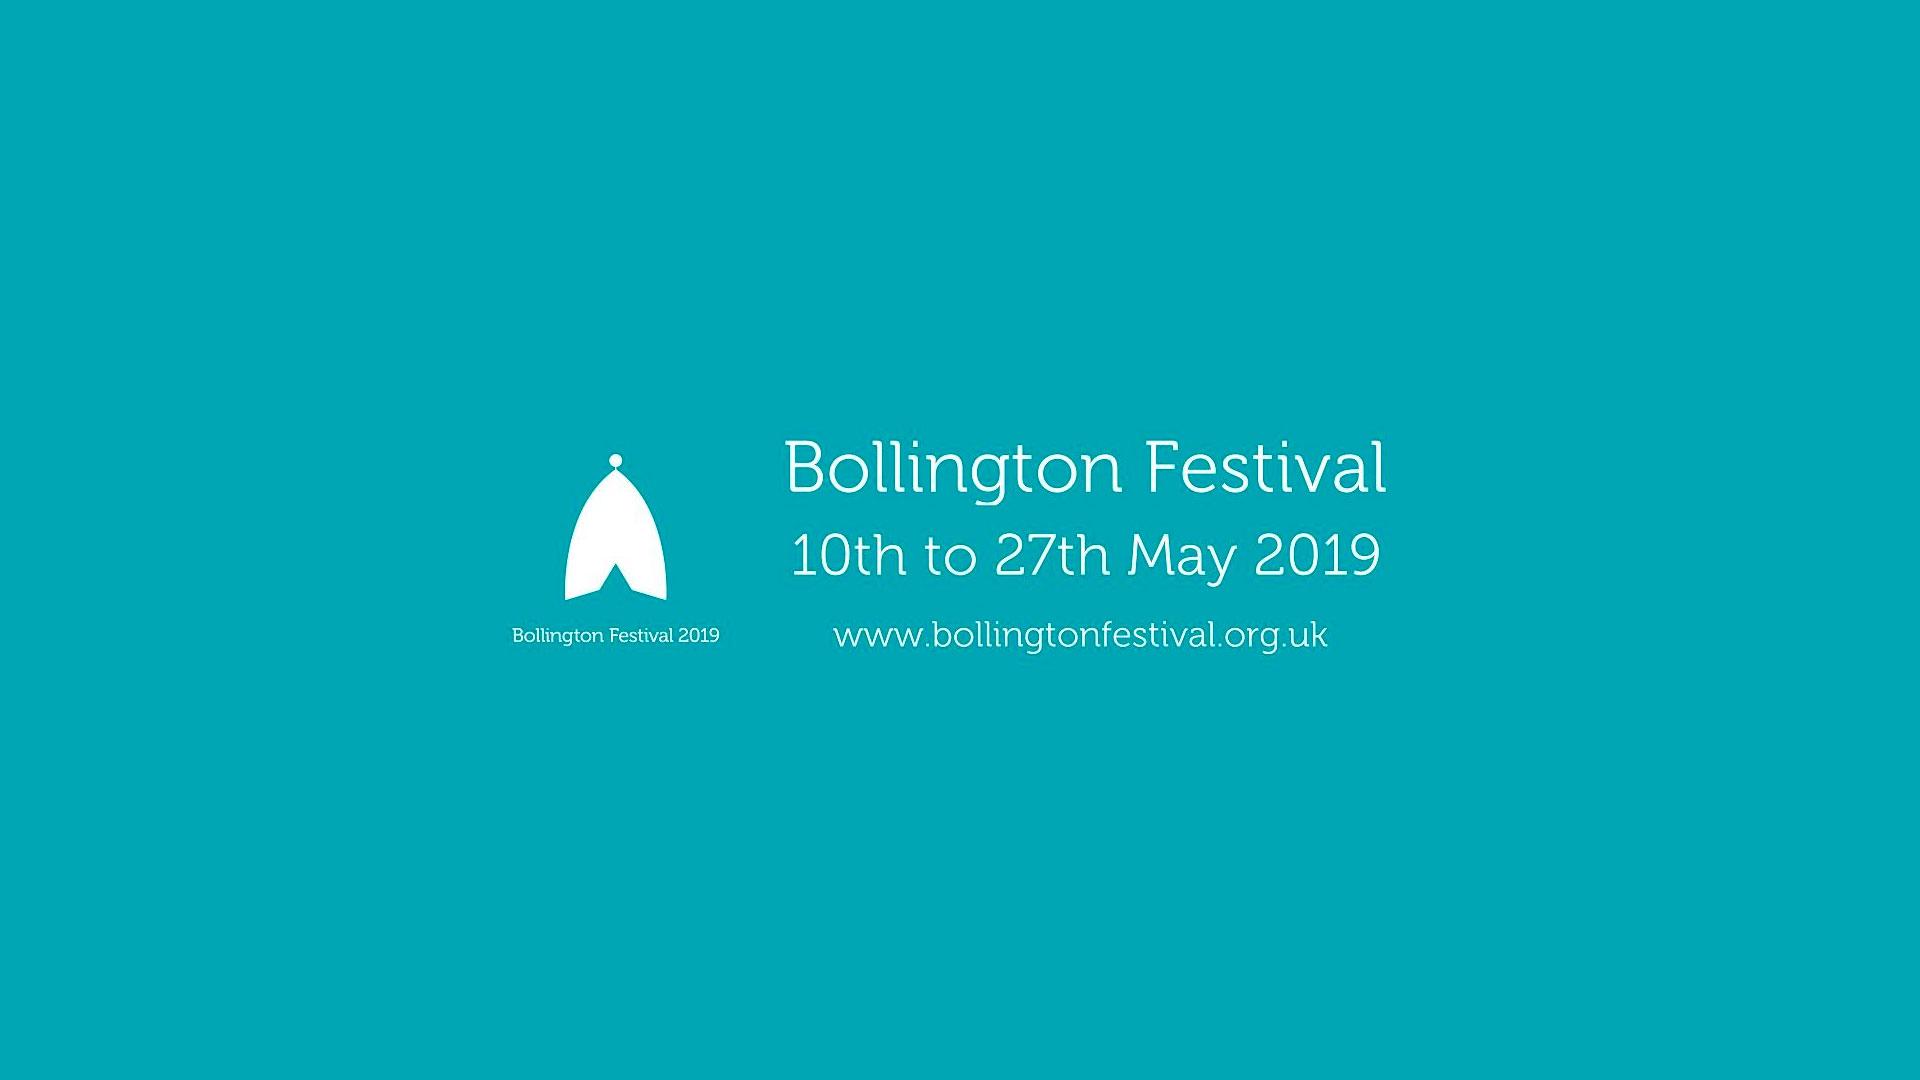 Tarantino Disco confirmed for Bollington Festival 2019